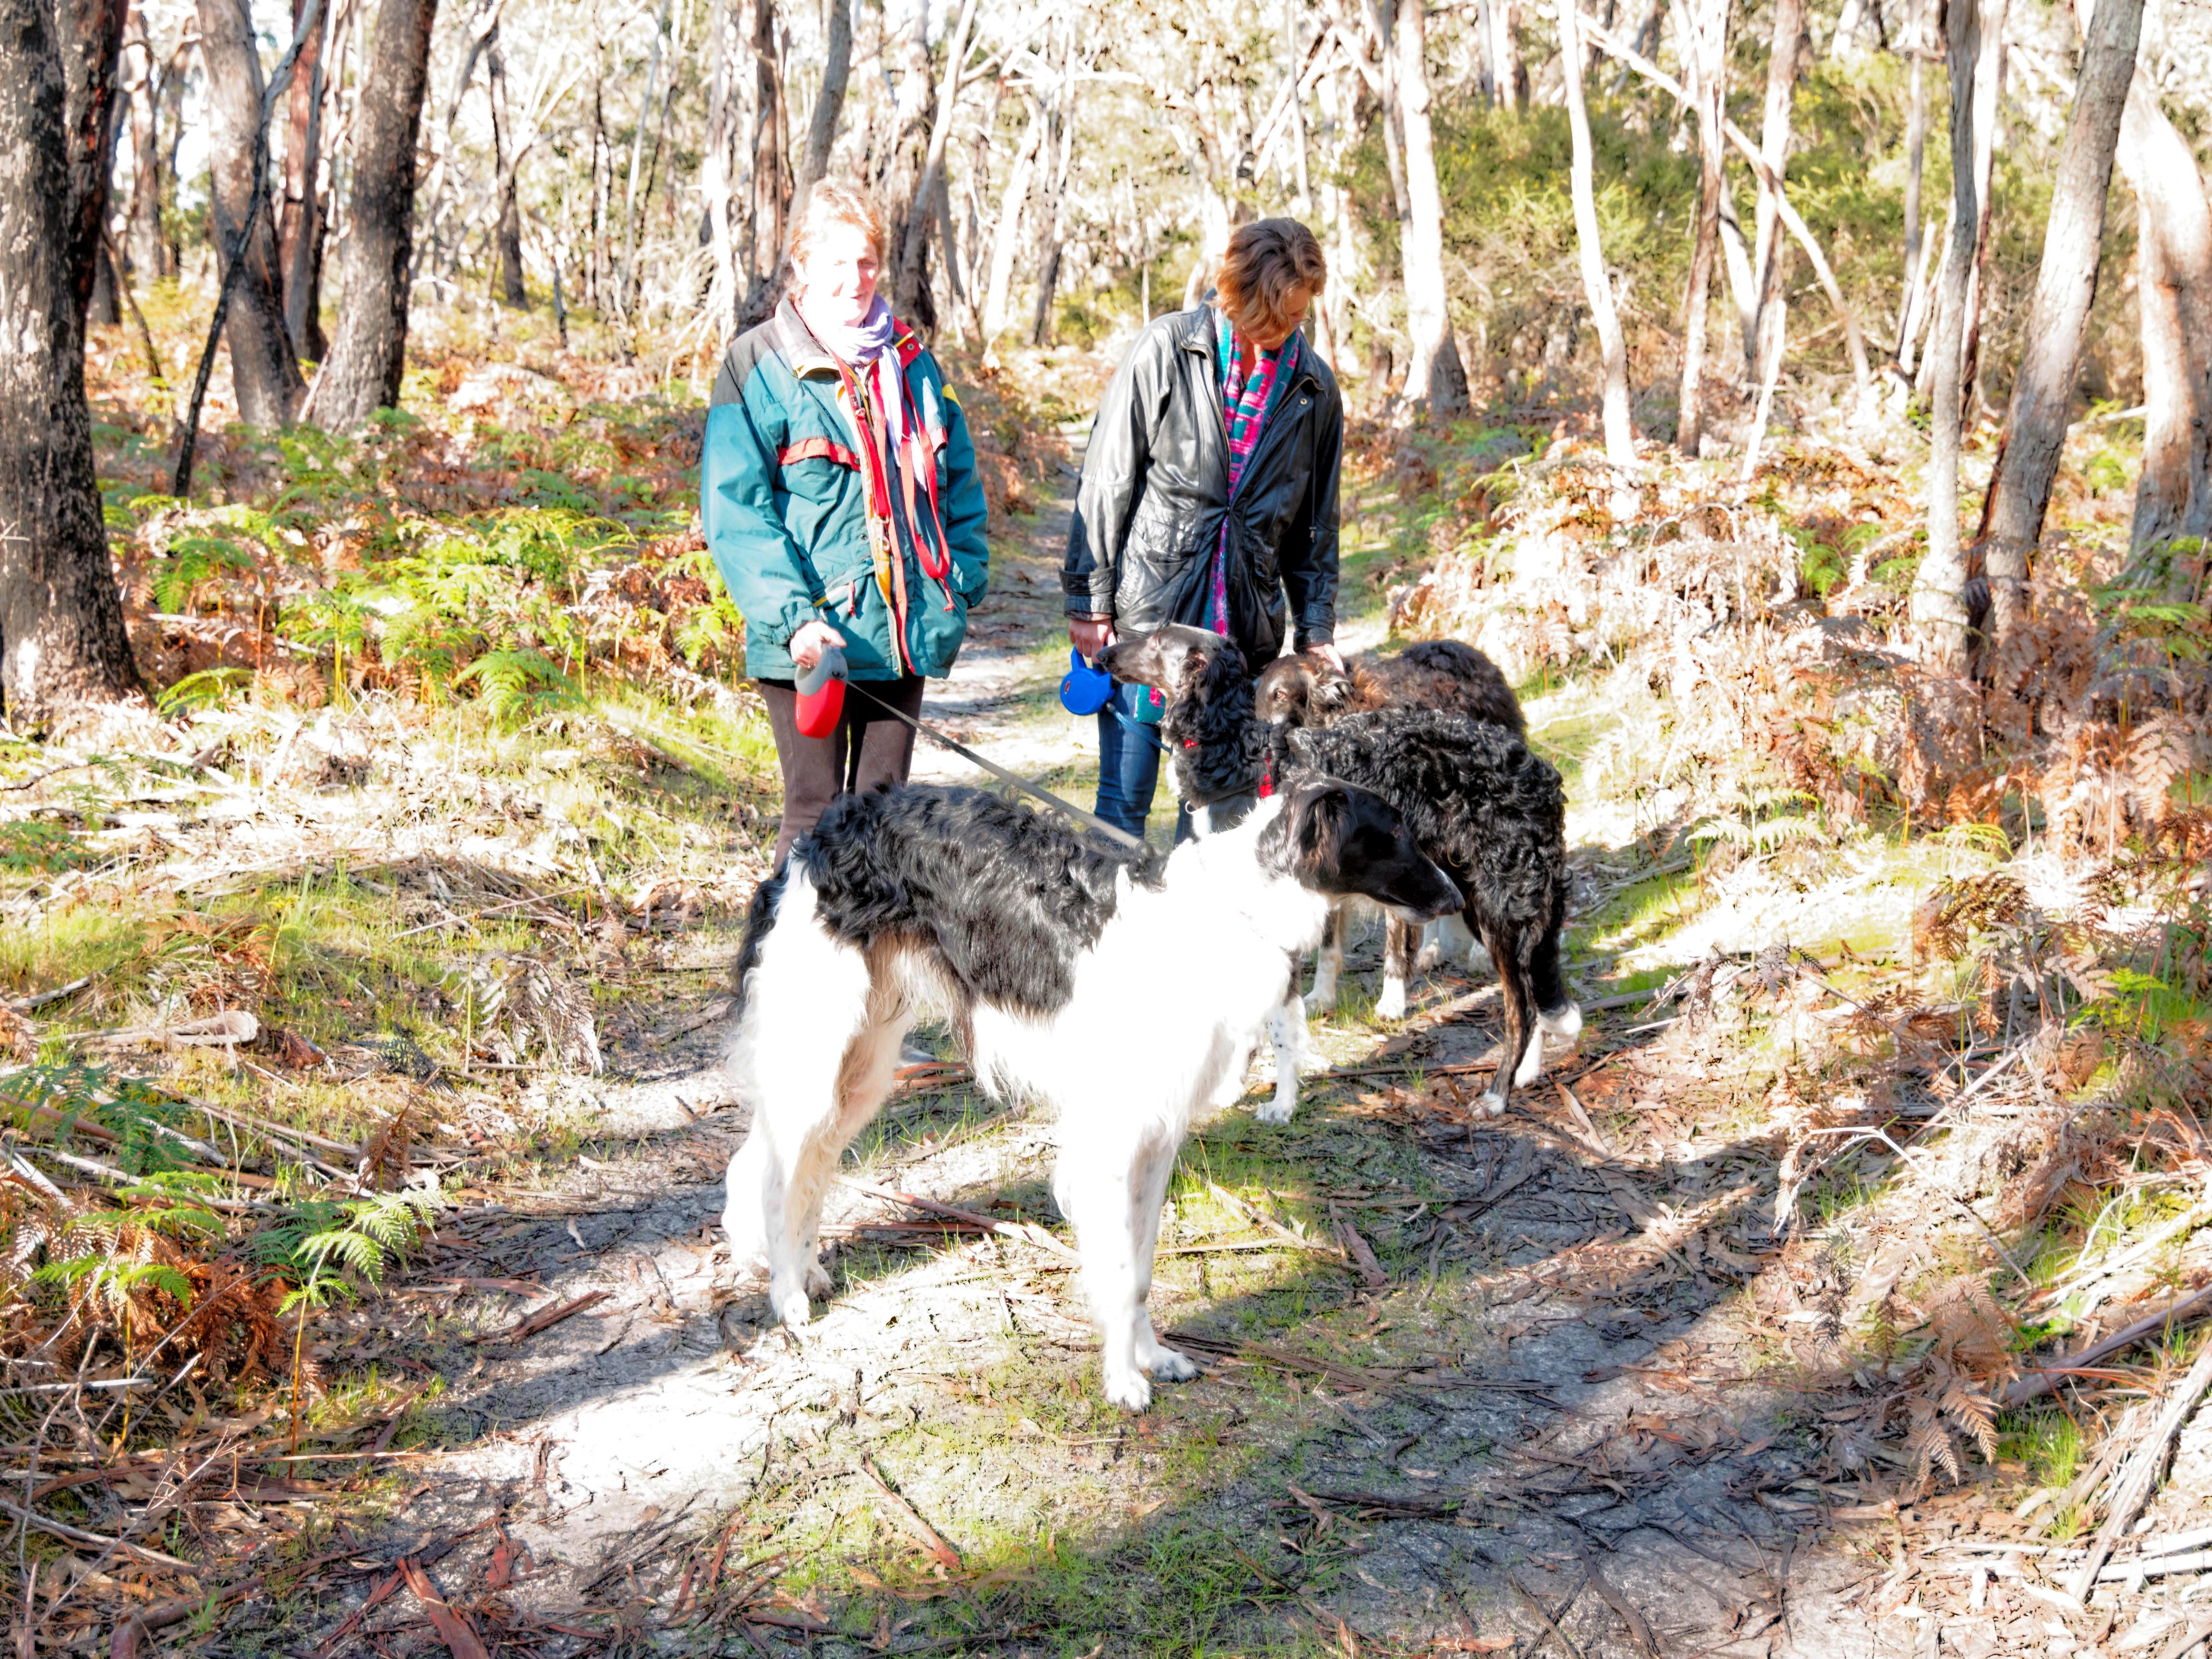 Walk-in-forest-12.jpeg